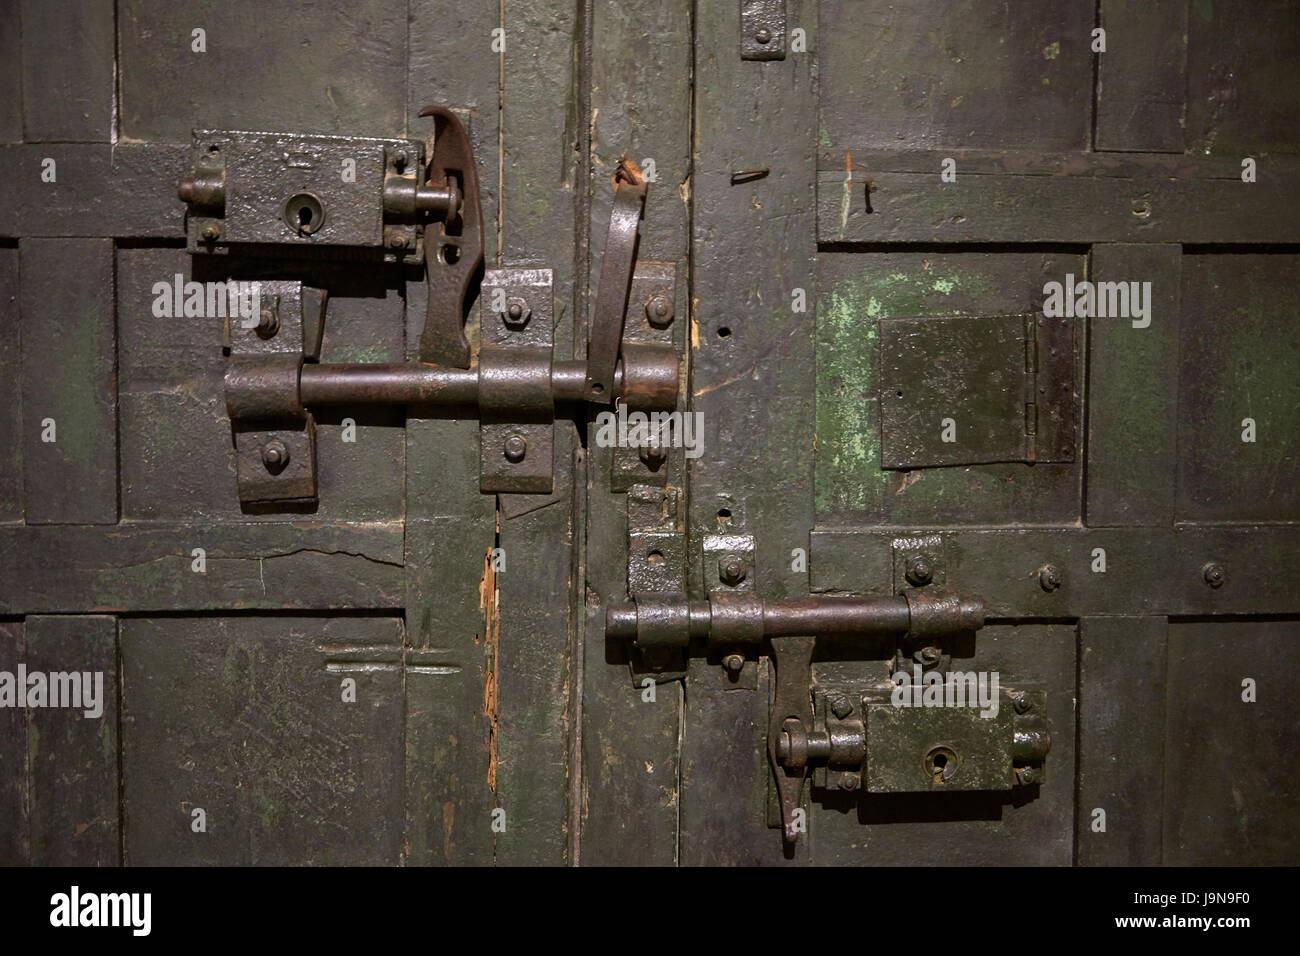 Schlösser an der Tür, Hoa Lo Gefängnismuseum, (Aka Hanoi Hilton), Hanoi, Vietnam Stockfoto